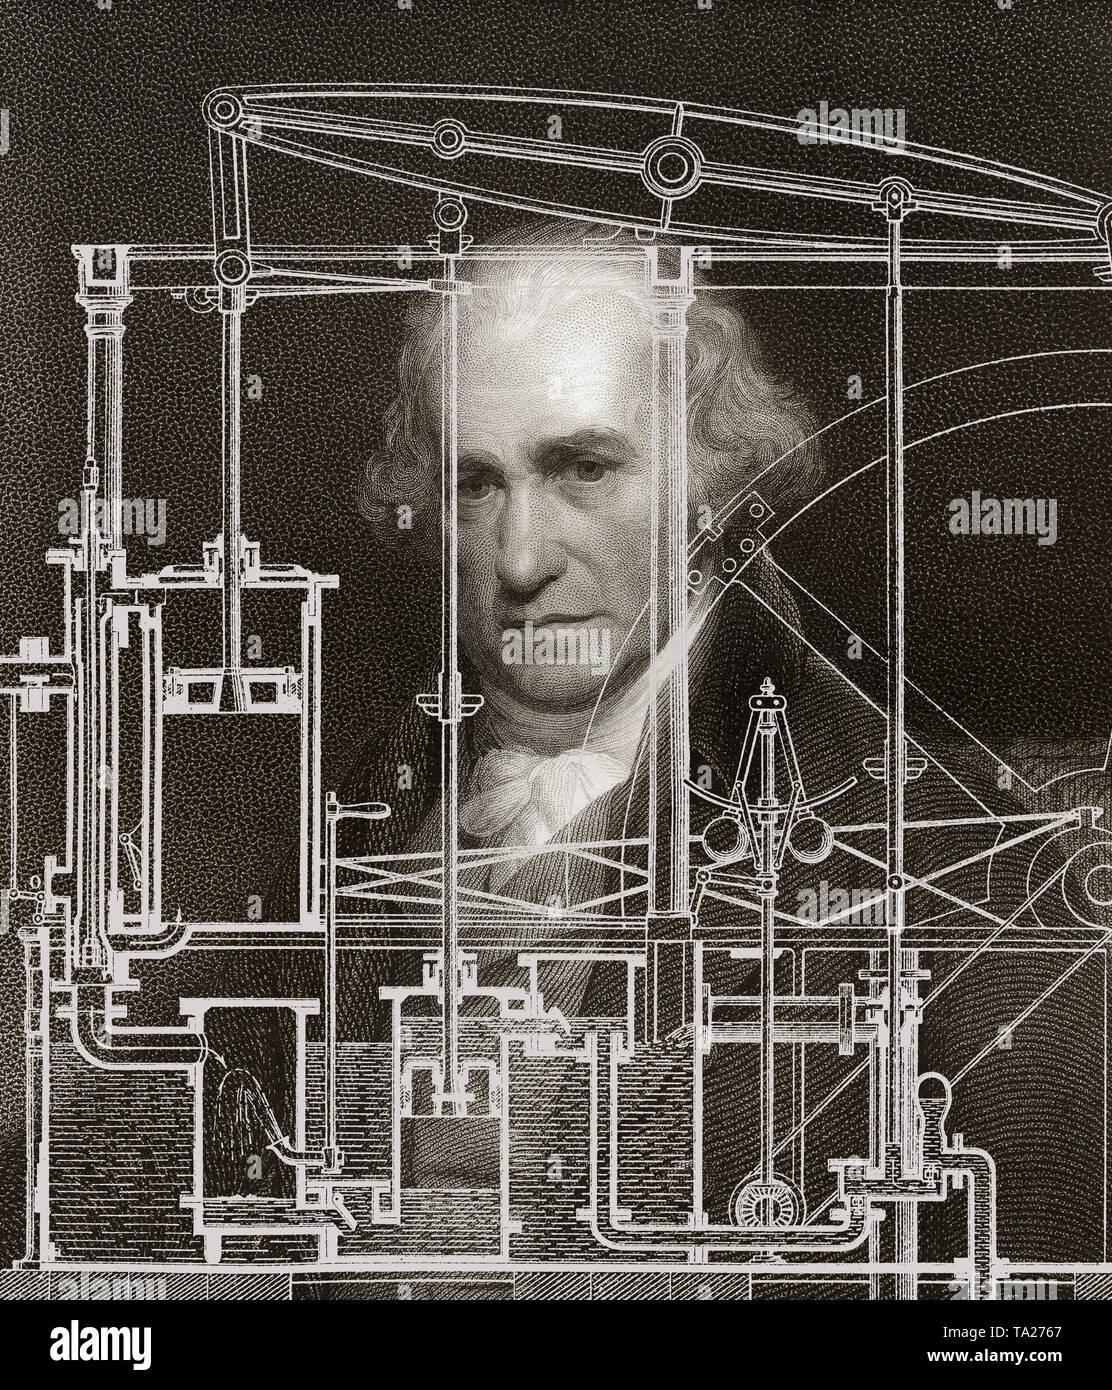 Piston heat engine by James Watt, 1736 - 1819, Scottish inventor of the steam engine - Stock Image